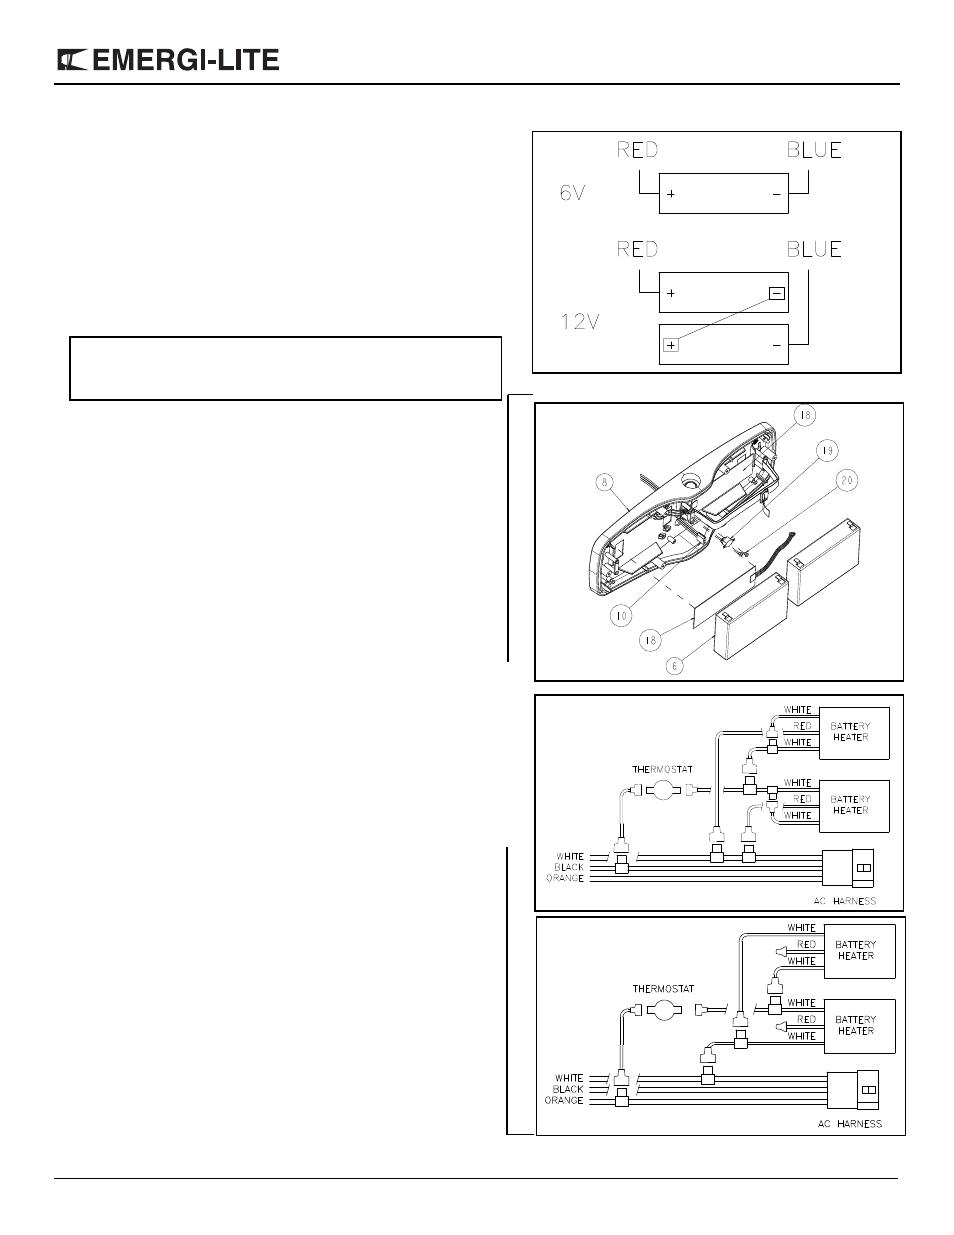 120v 277v Emergi Lite Survive All Sv Series User Manual Page 3 4